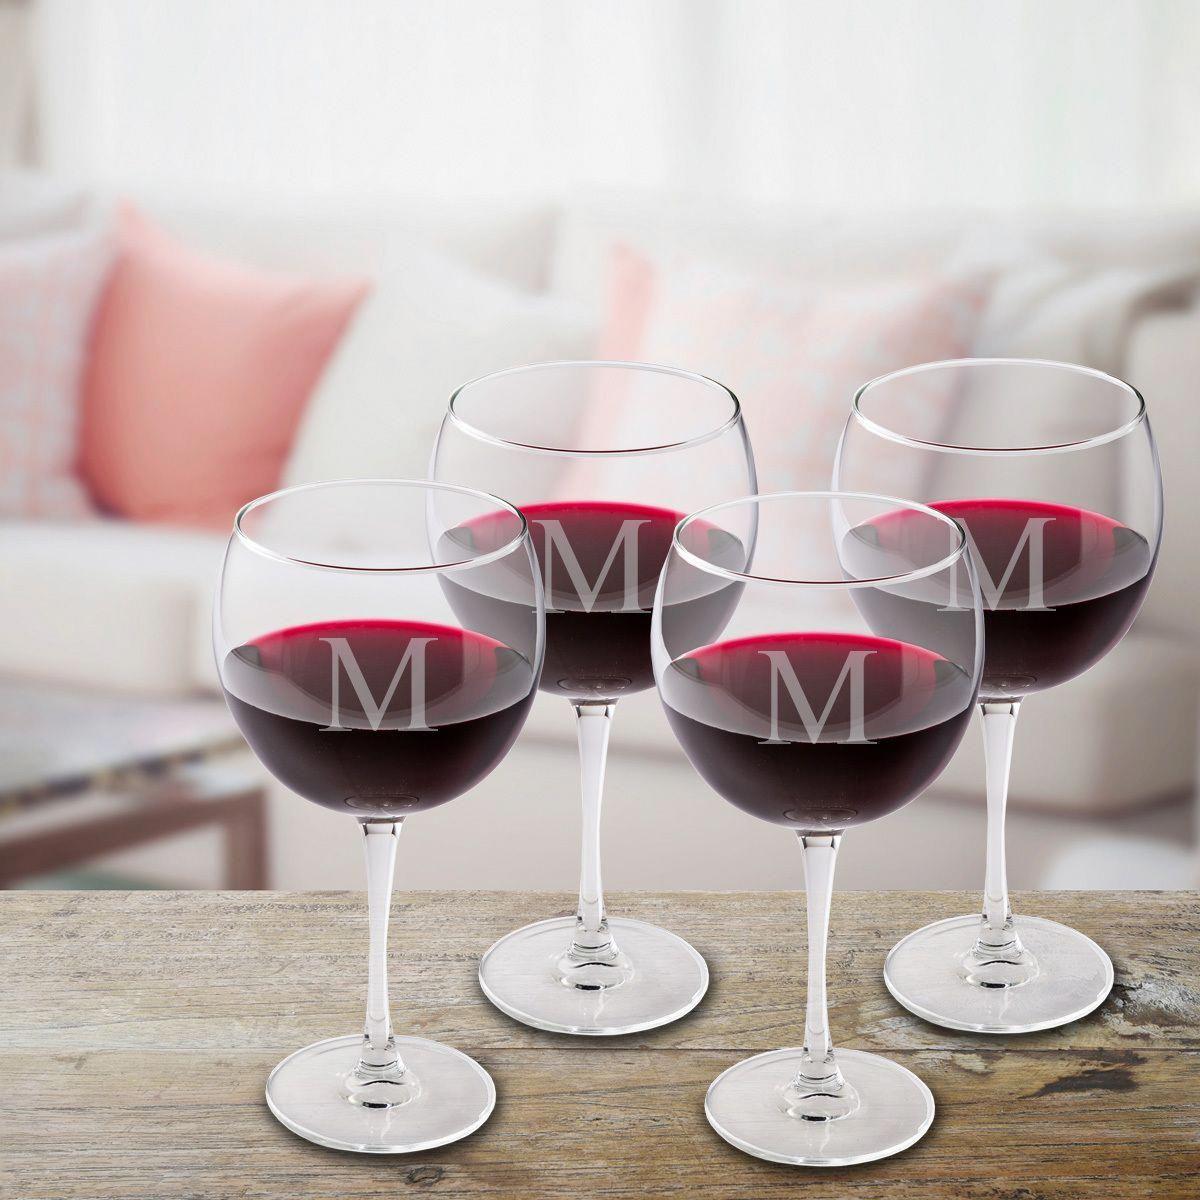 Luxury Wine Gifts Winegiftbags Info 5445928452 Winehouse Personalized Wine Glasses Personalized Wine Glass Set Red Wine Glasses